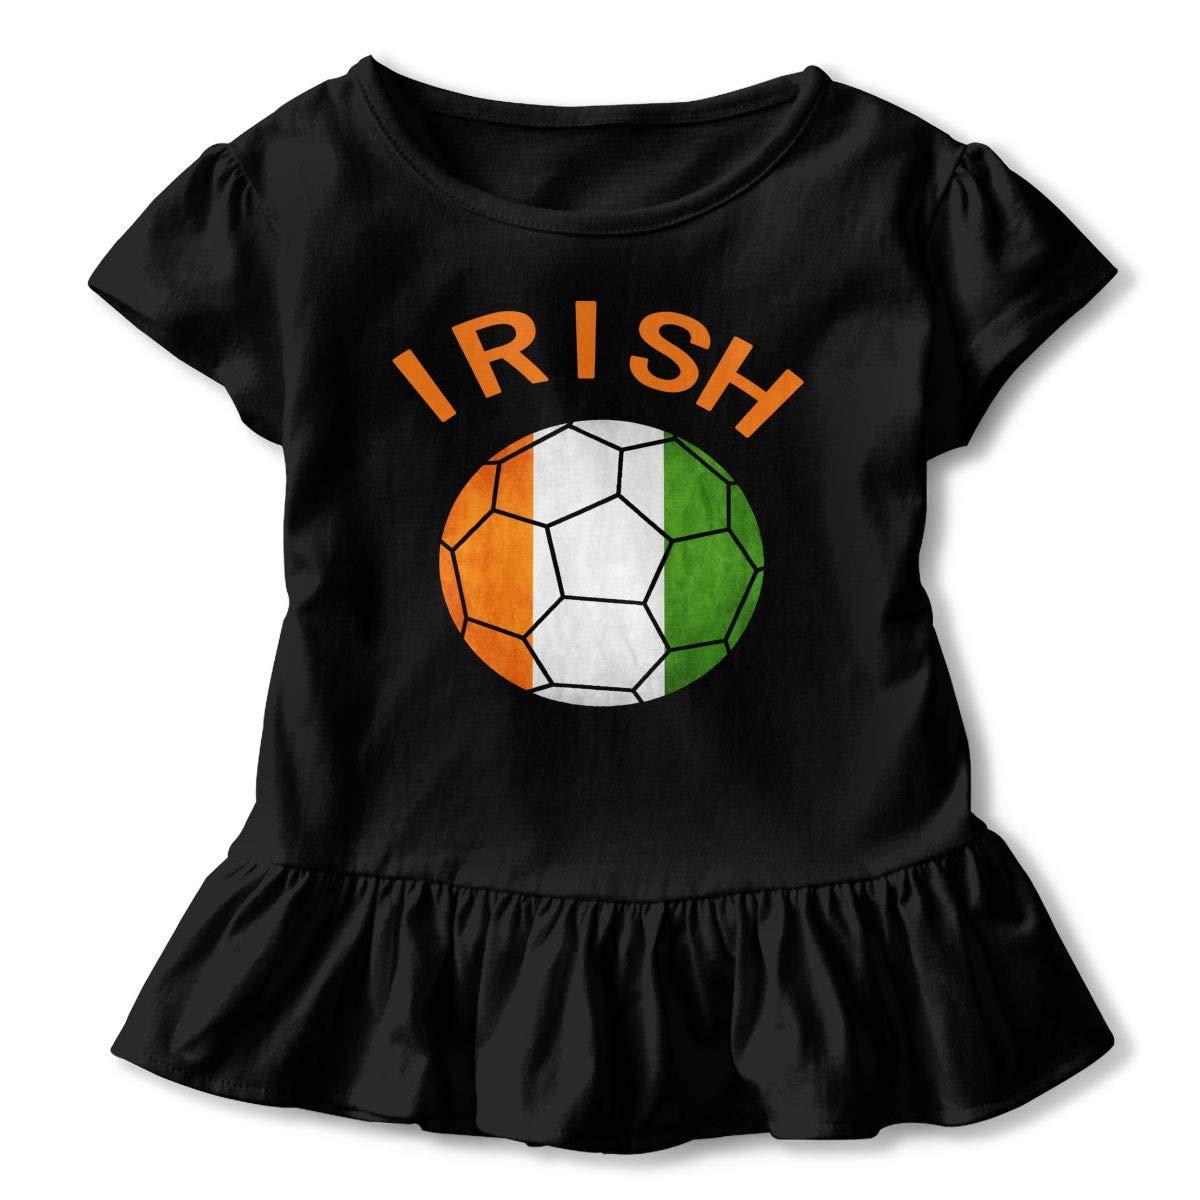 SHIRT1-KIDS Irish Soccer Shirt Childrens Girls Short Sleeve Ruffles Shirt Tee Jersey for 2-6 Toddlers